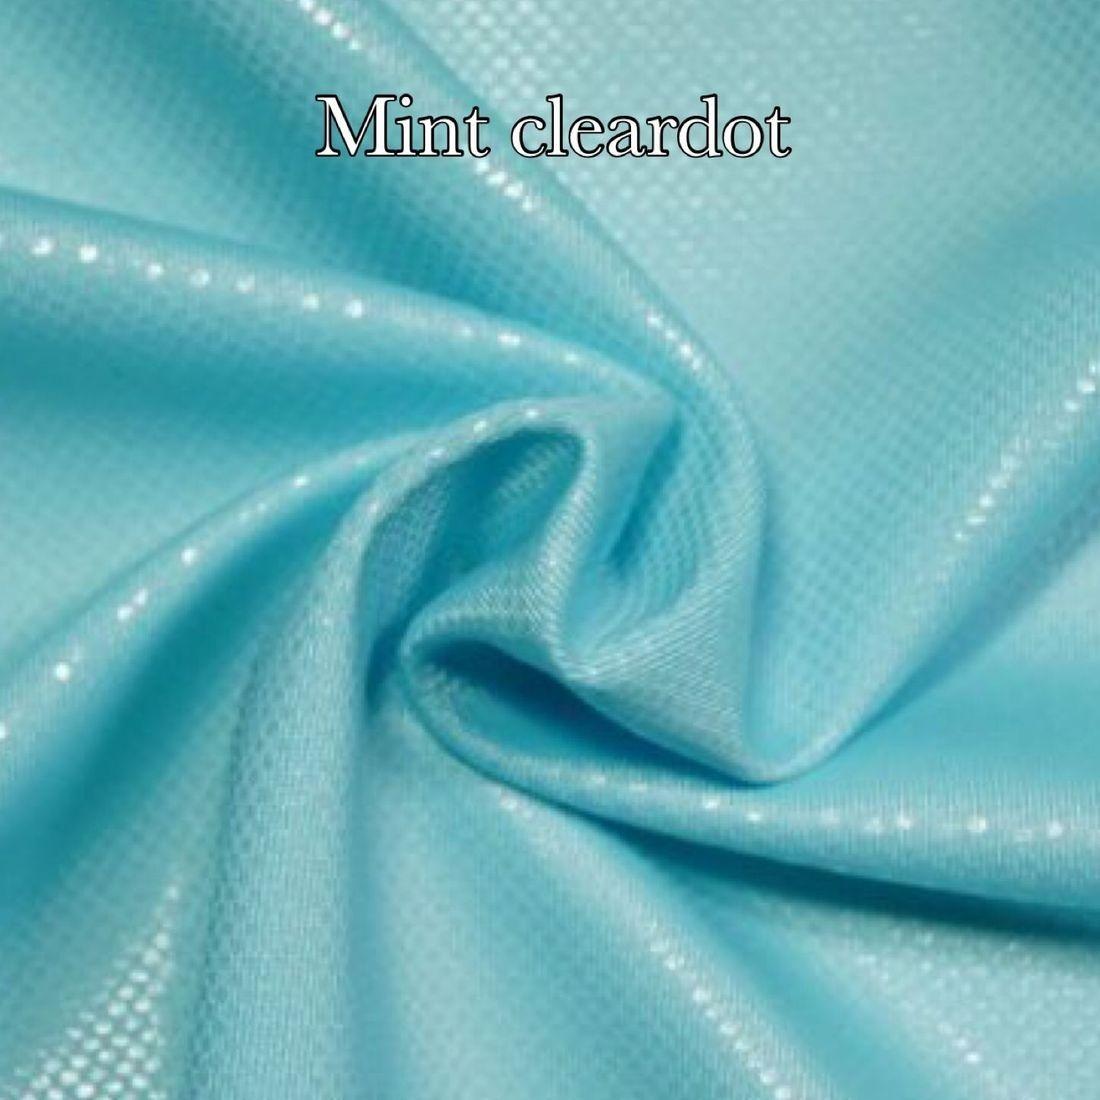 Light blue cleardot